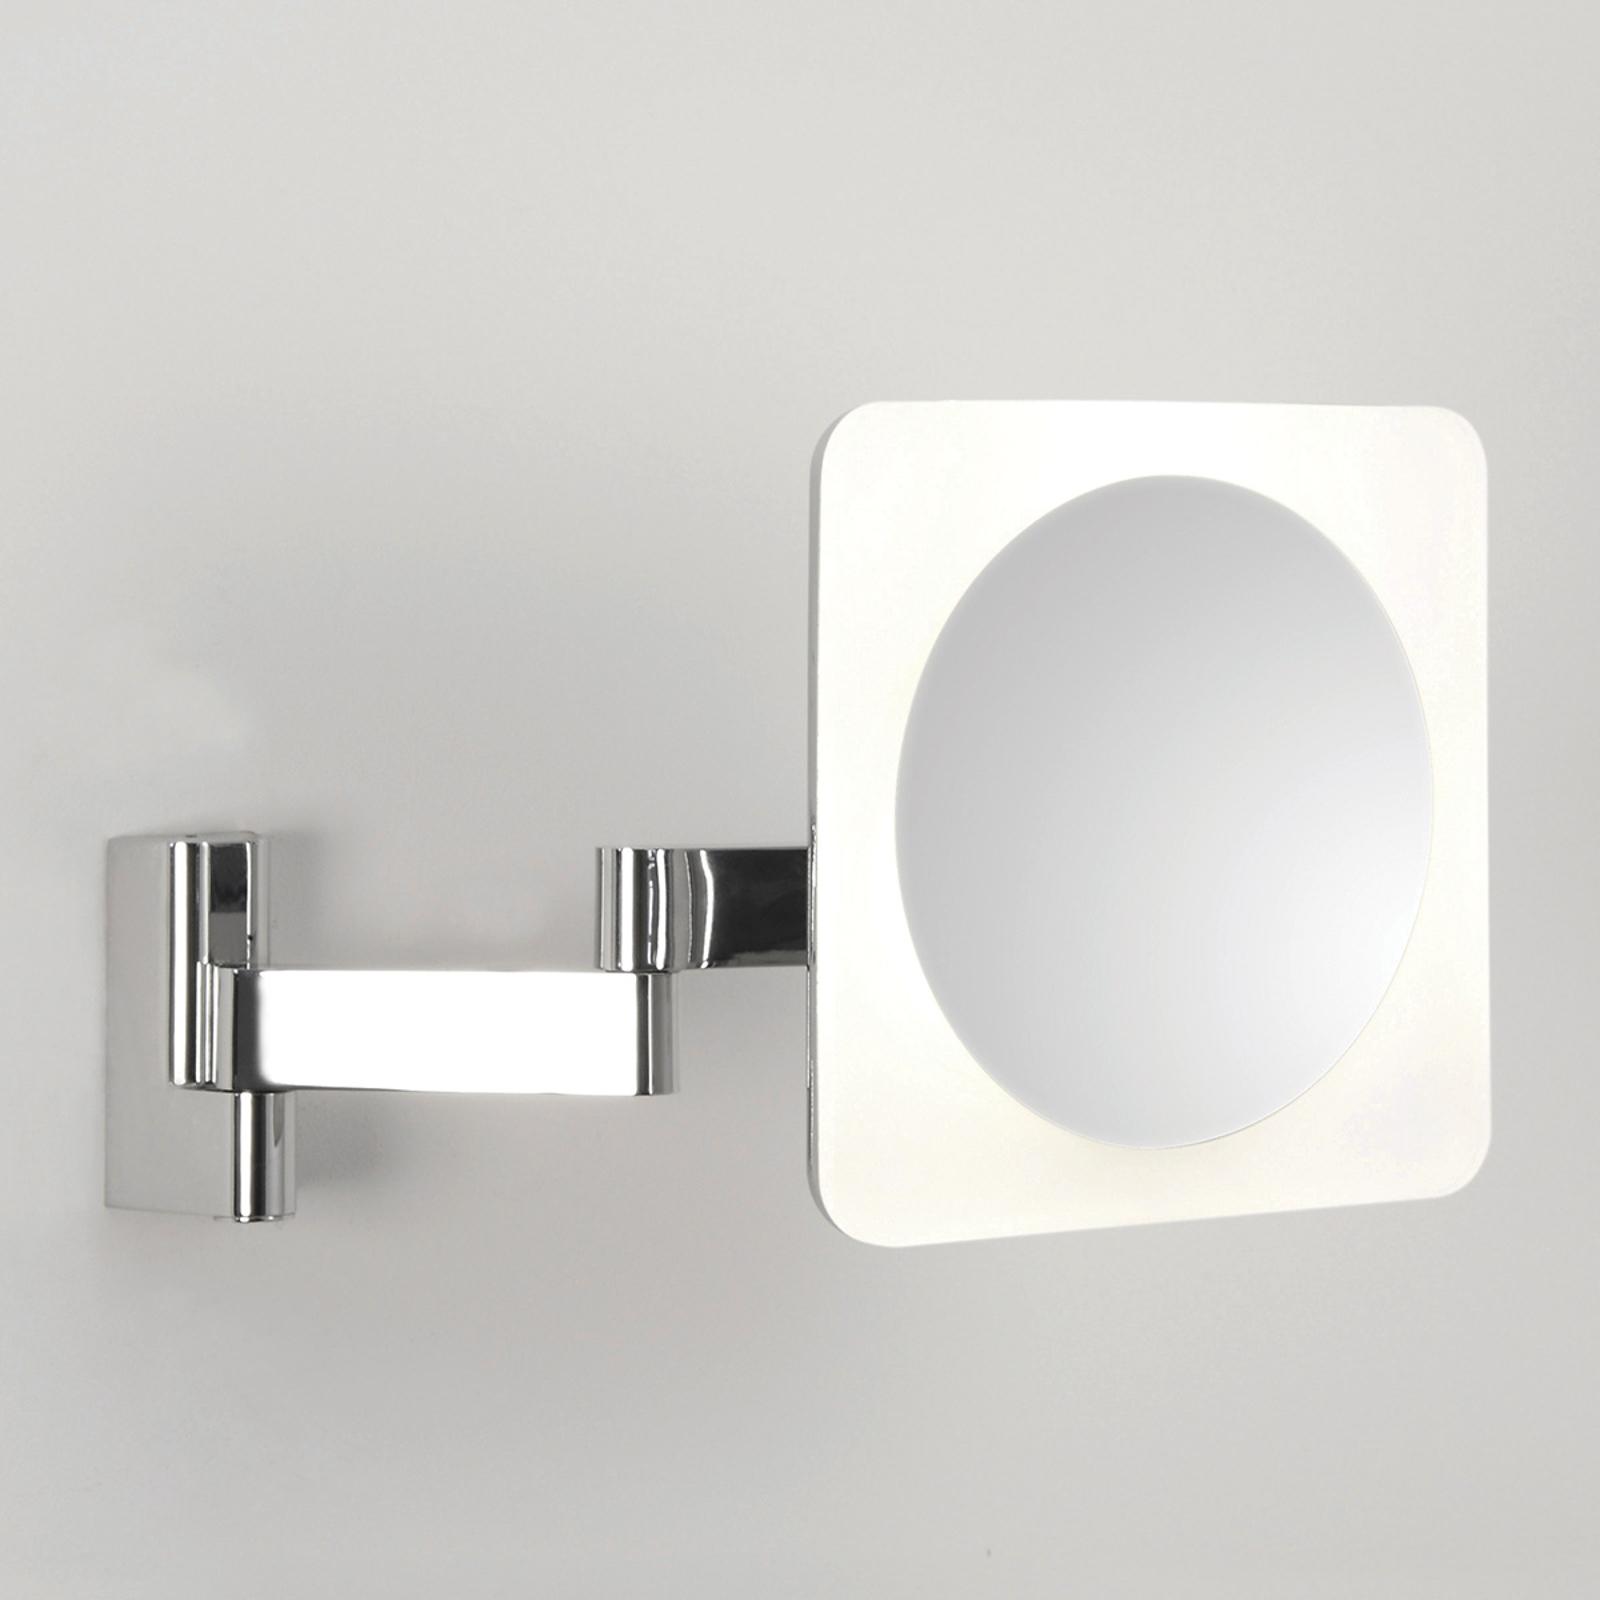 5-voudig vergrotende LED-spiegel Niimi Square